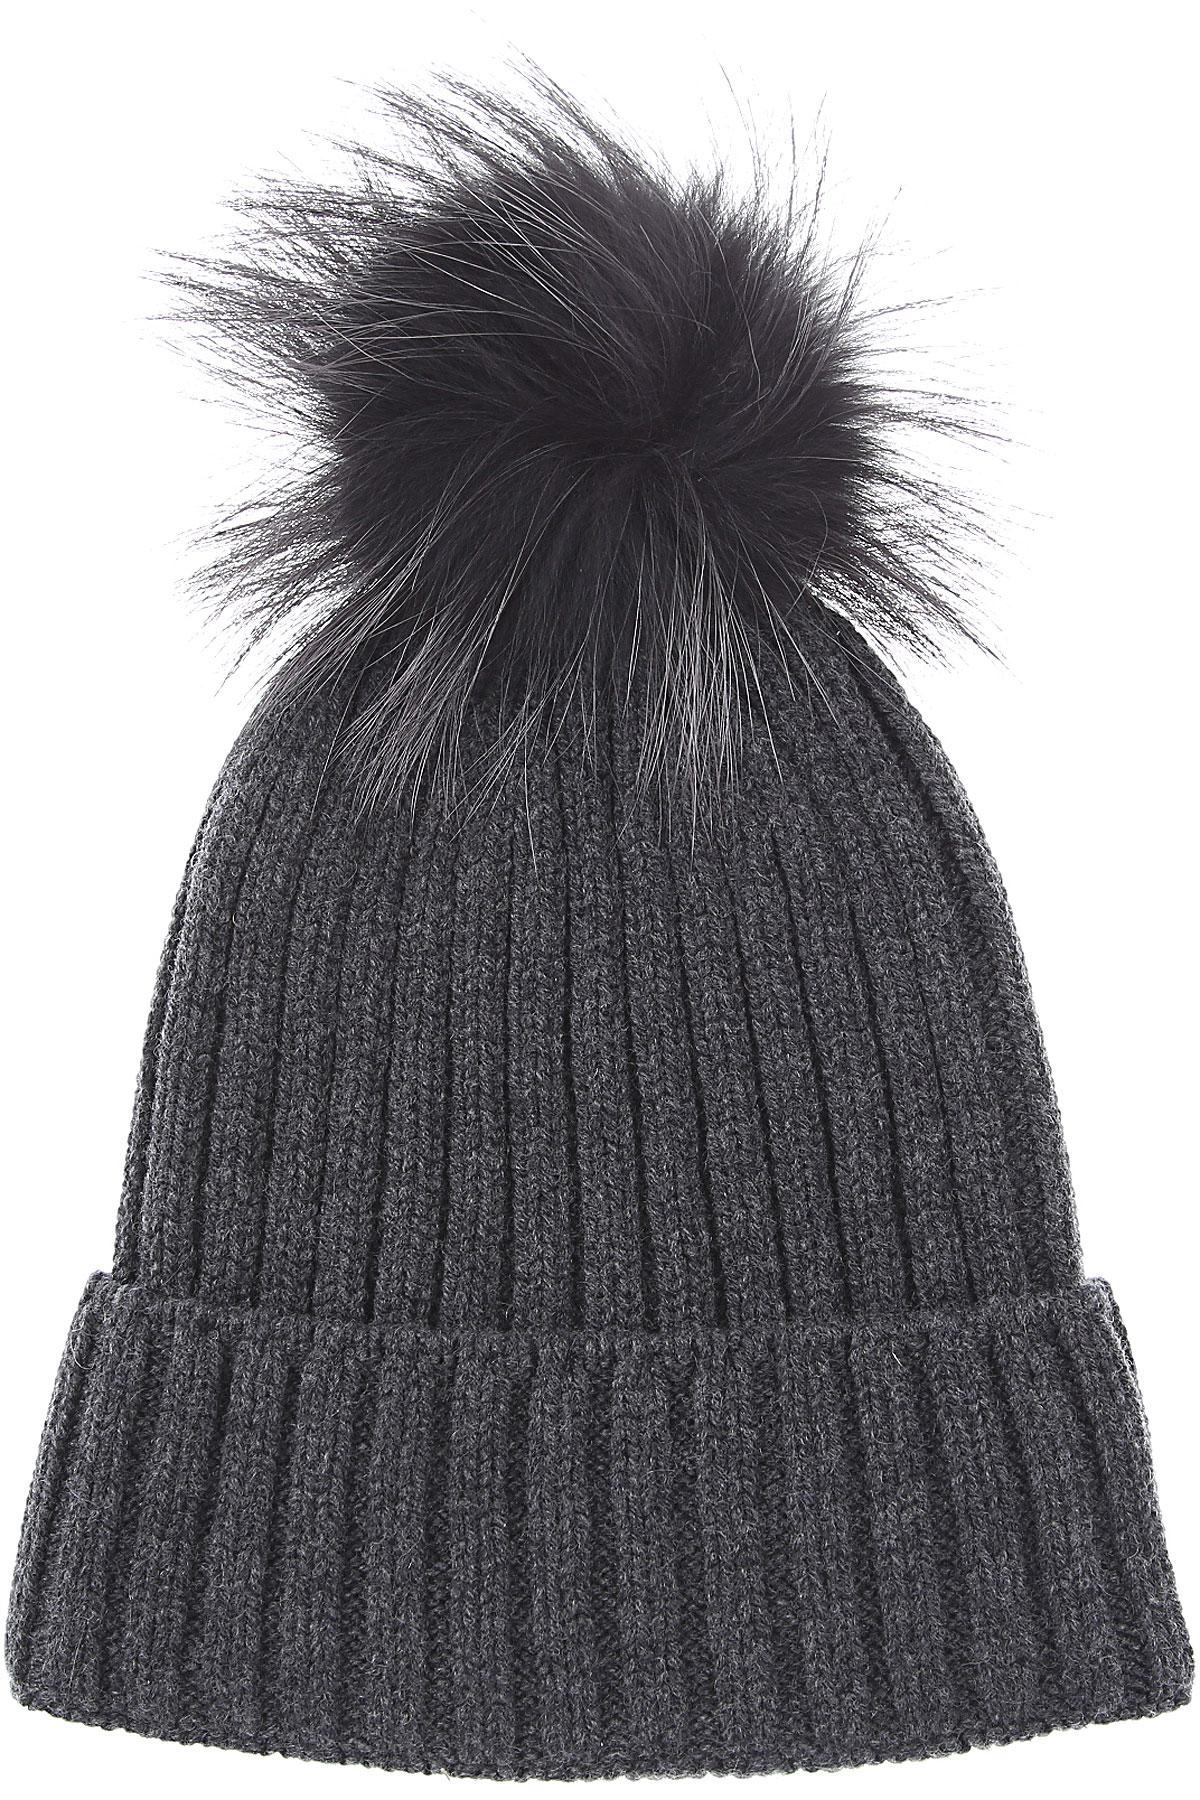 Fabiana Filippi Hat for Women On Sale, Deep Blue Antracite, Wool, 2019